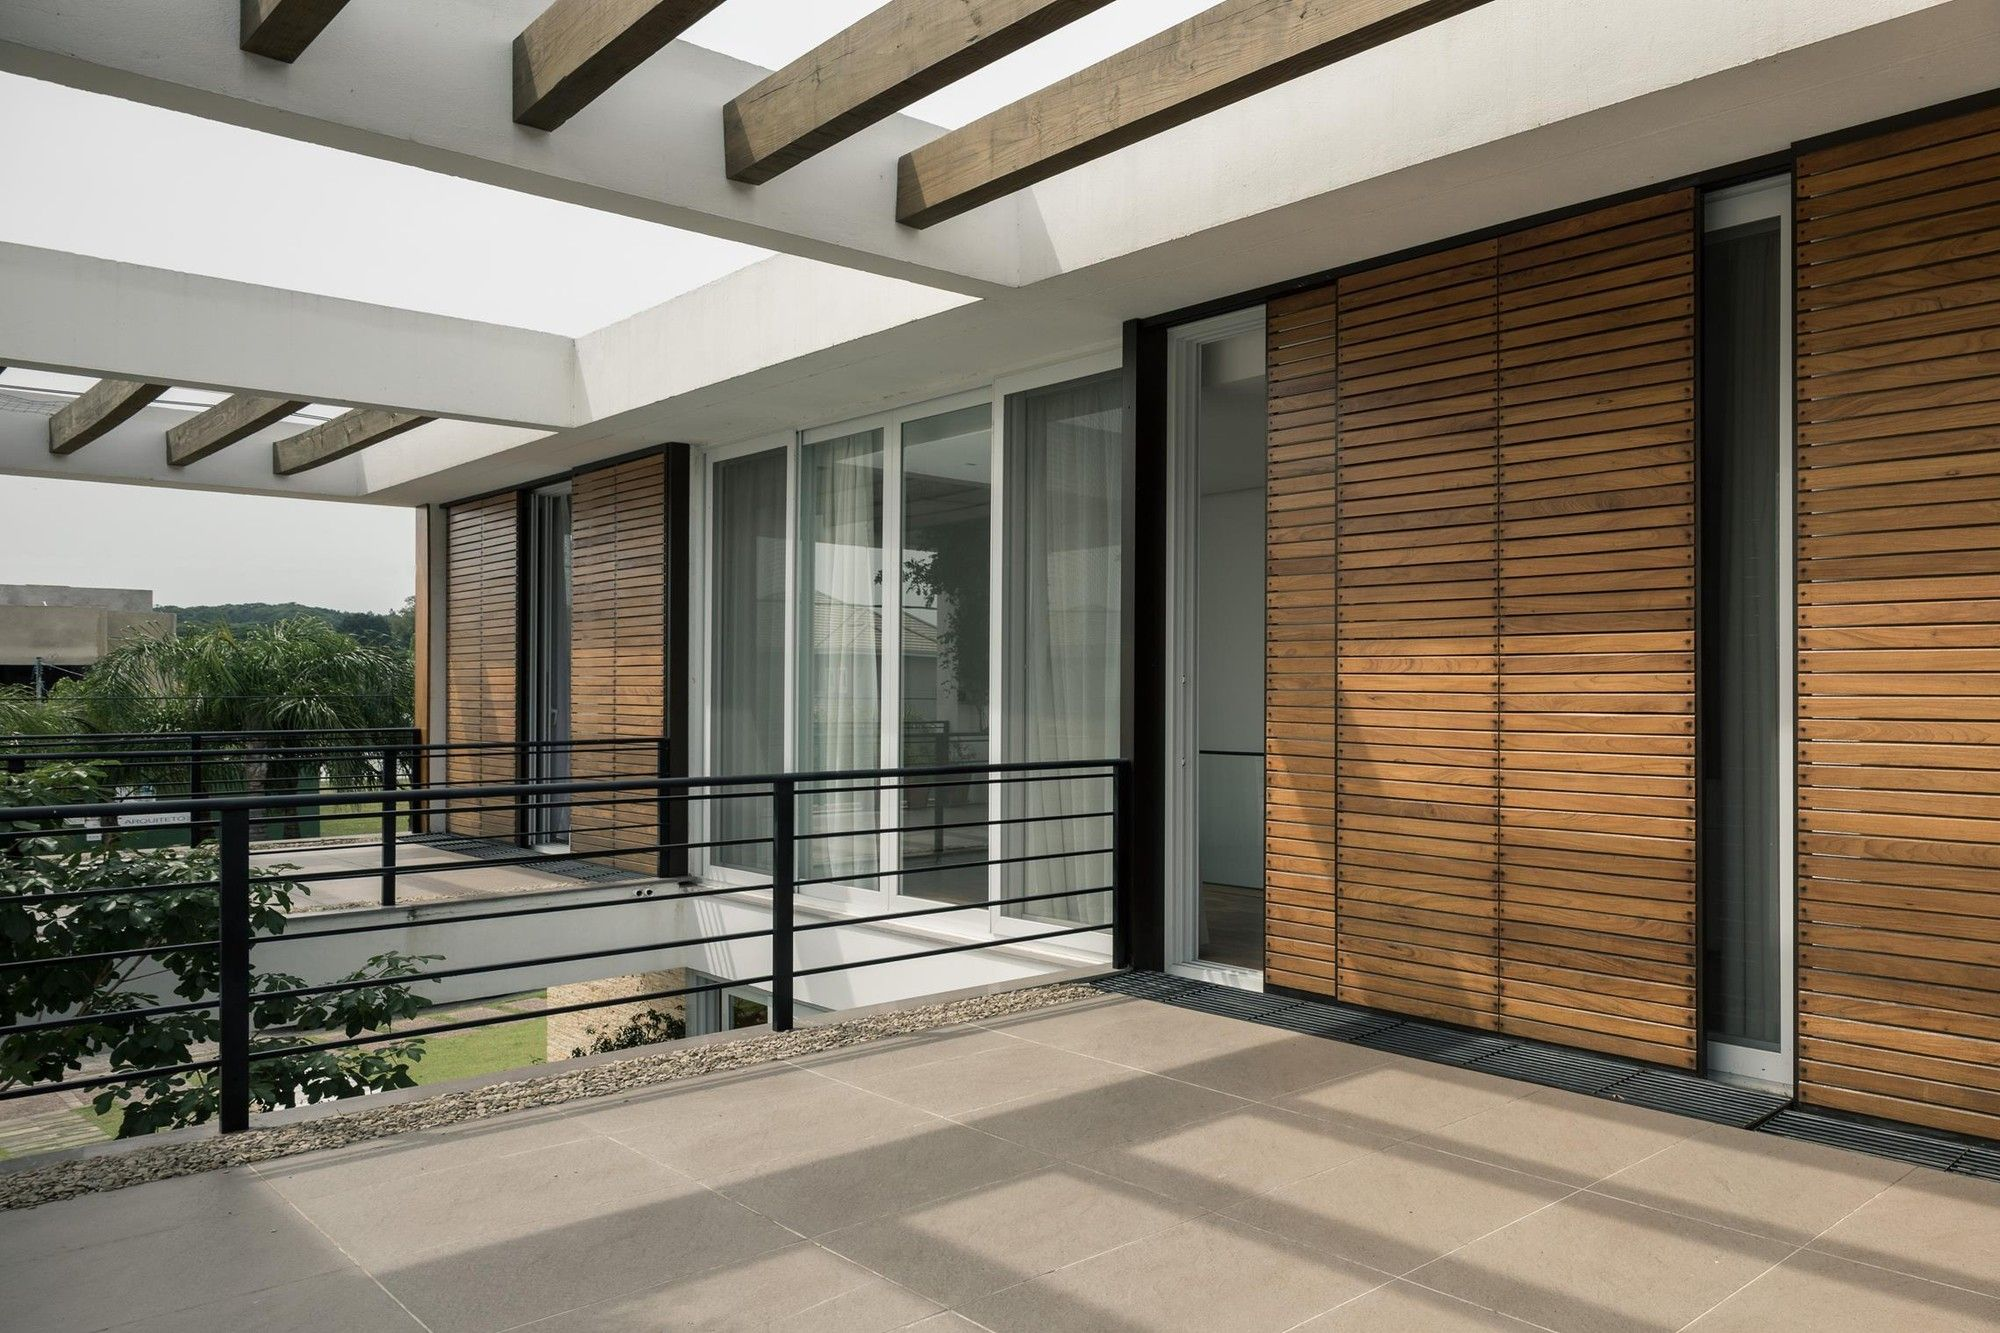 Gallery of terraville house at arquitetura arquitetura